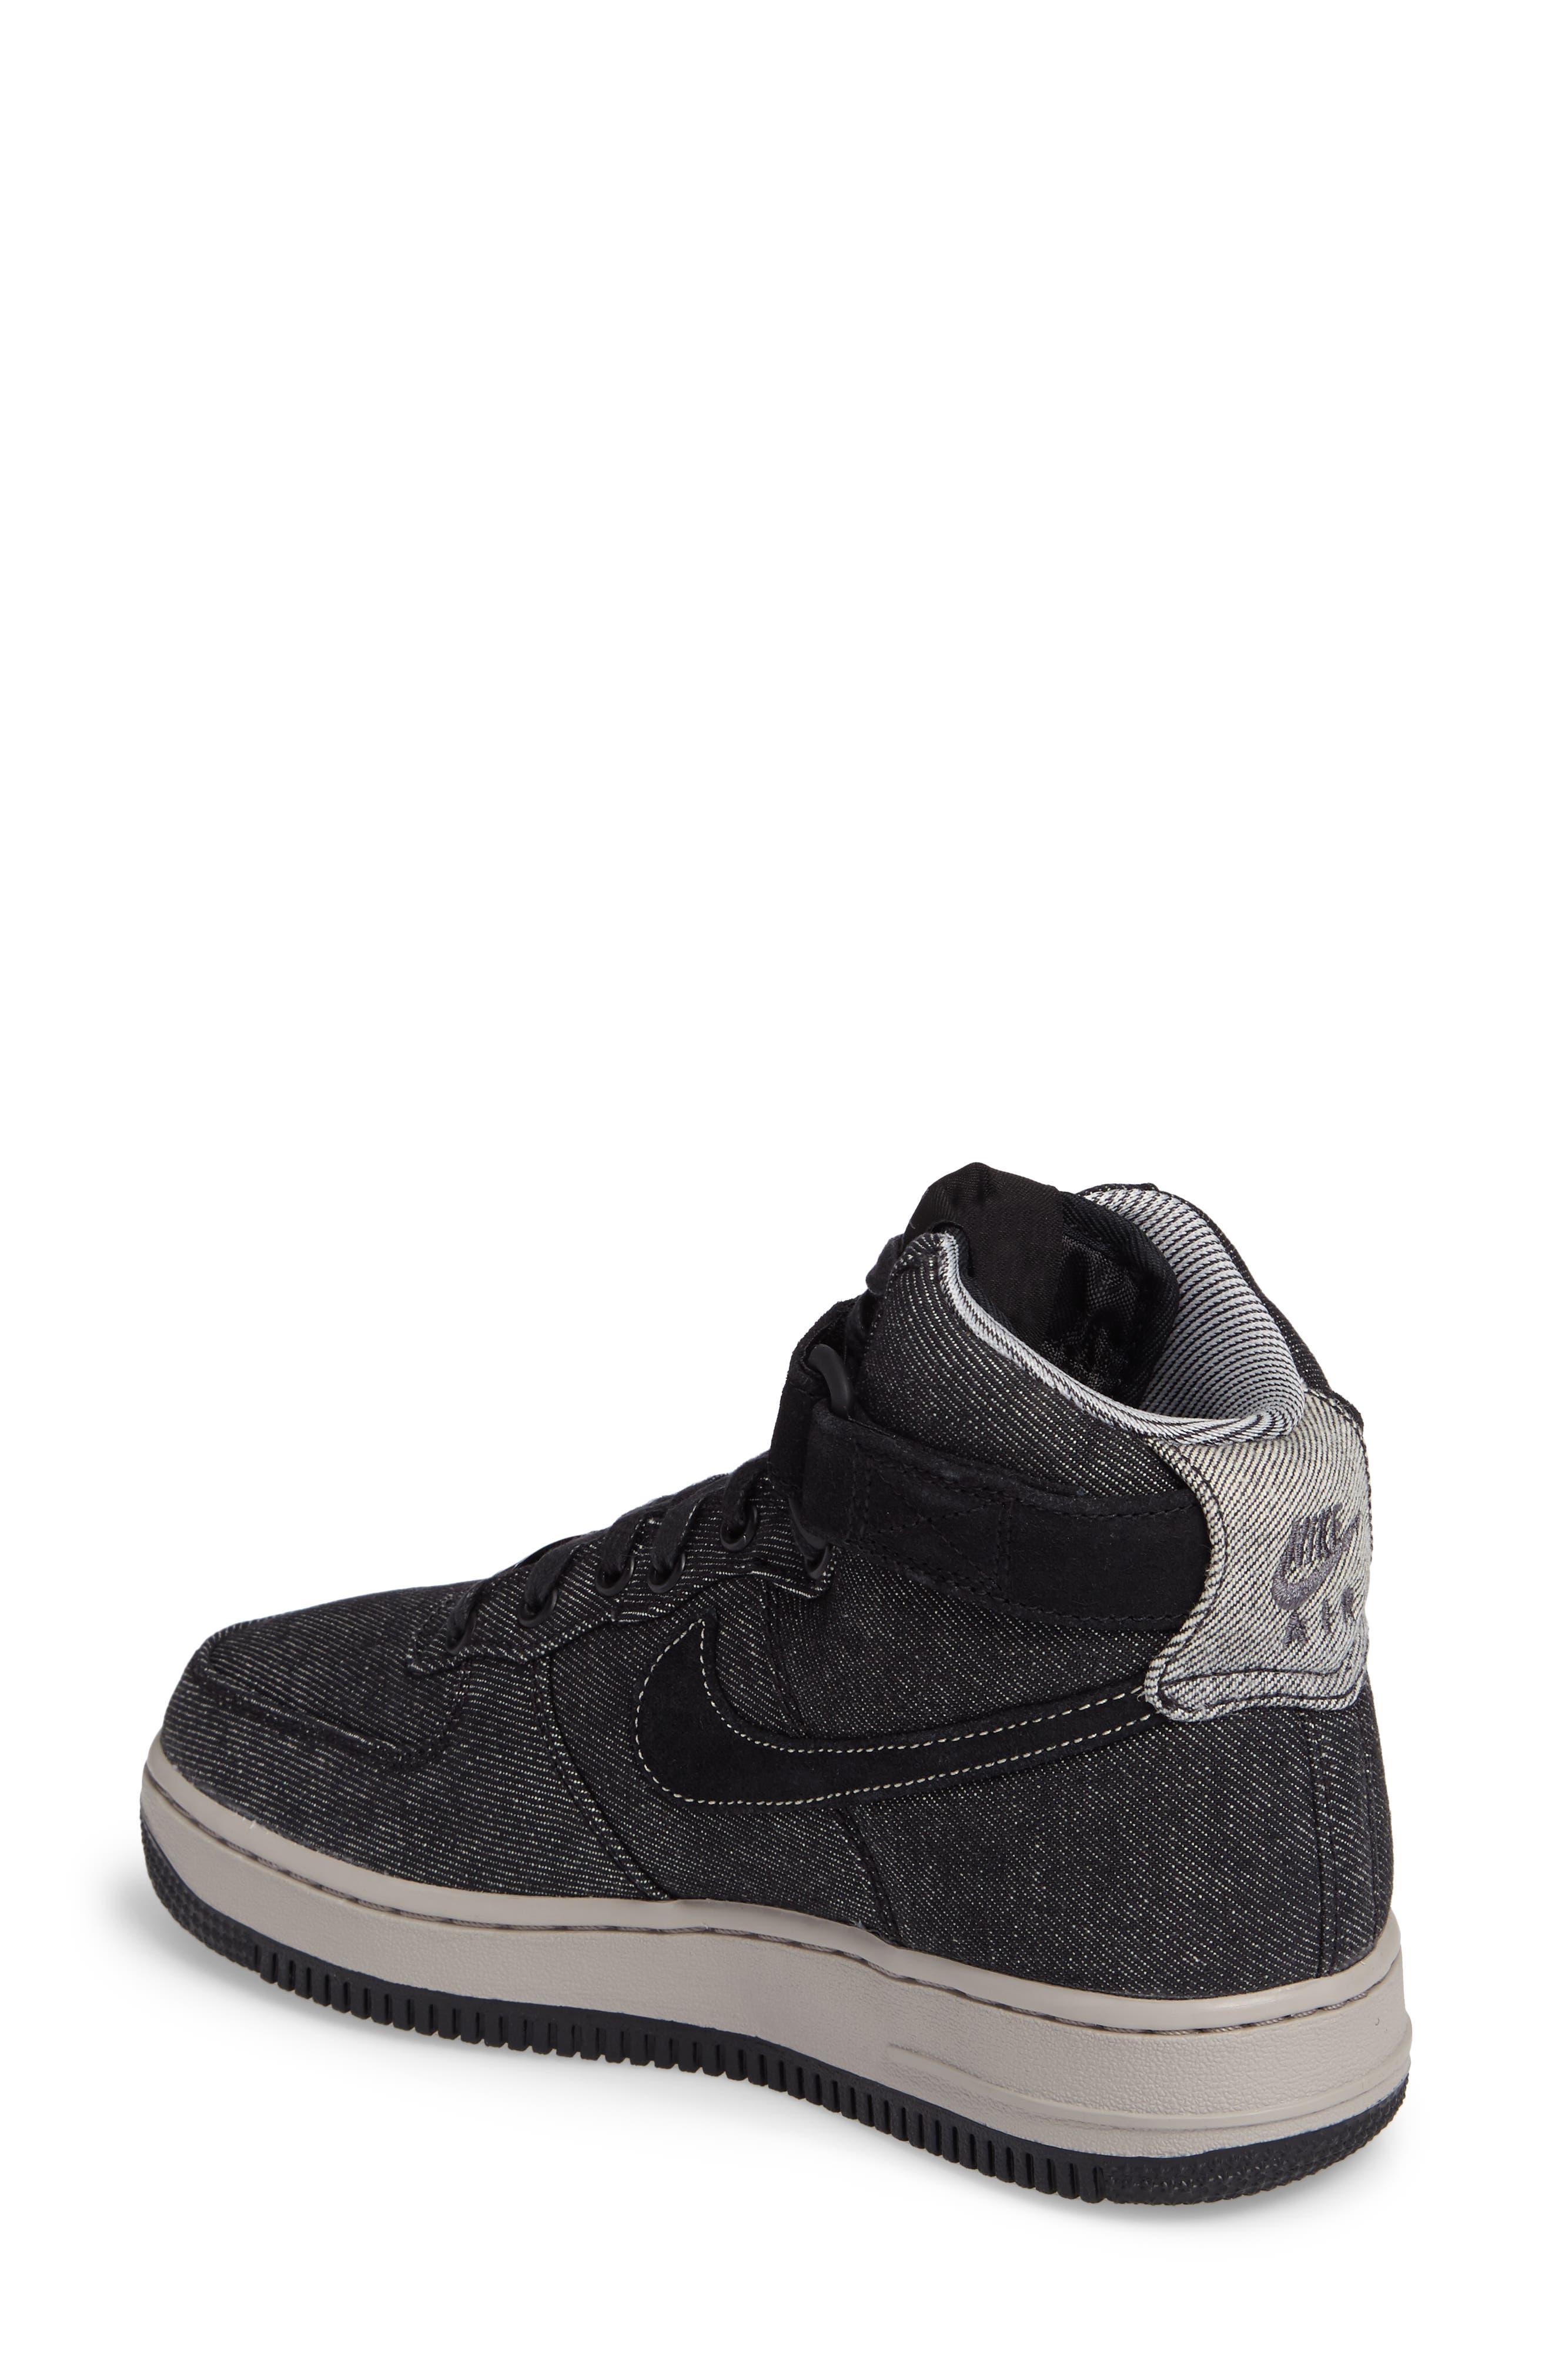 Alternate Image 2  - Nike Air Force 1 High Top SE Sneaker (Women)